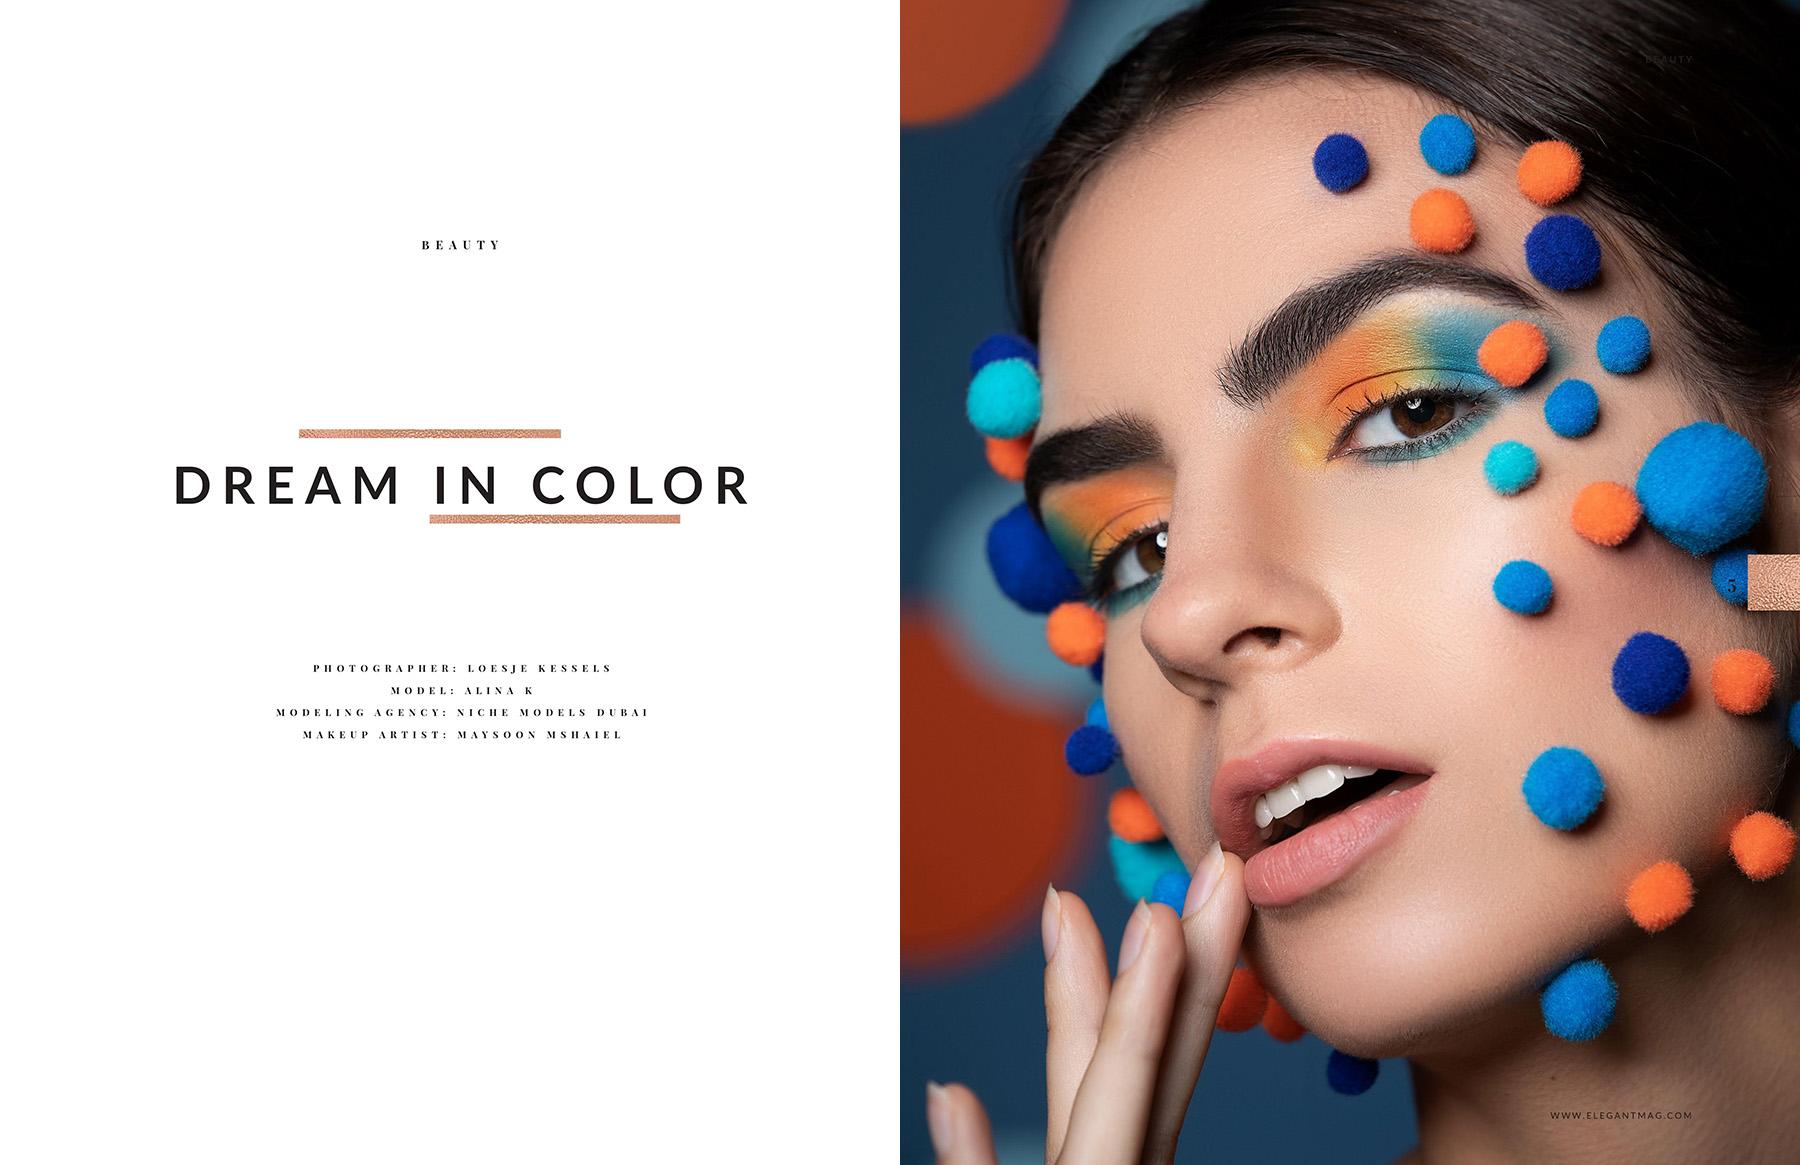 Editorial beauty photoshoot published in Elegant Magazine by Loesje Kessels Beauty Photographer Dubai